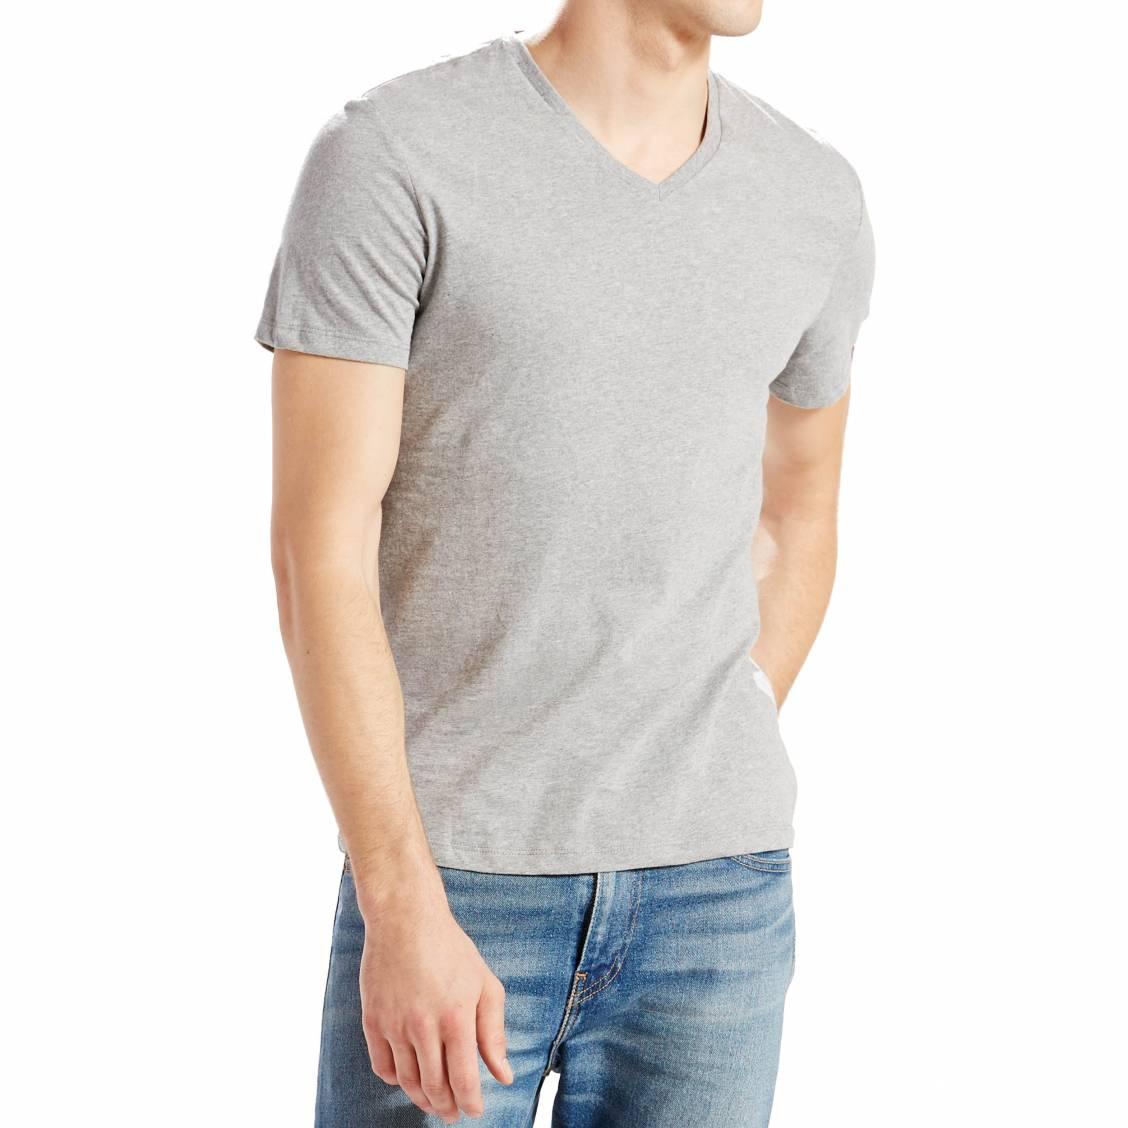 lot de 2 tee shirts levi 39 s slim fit v neck en coton gris. Black Bedroom Furniture Sets. Home Design Ideas